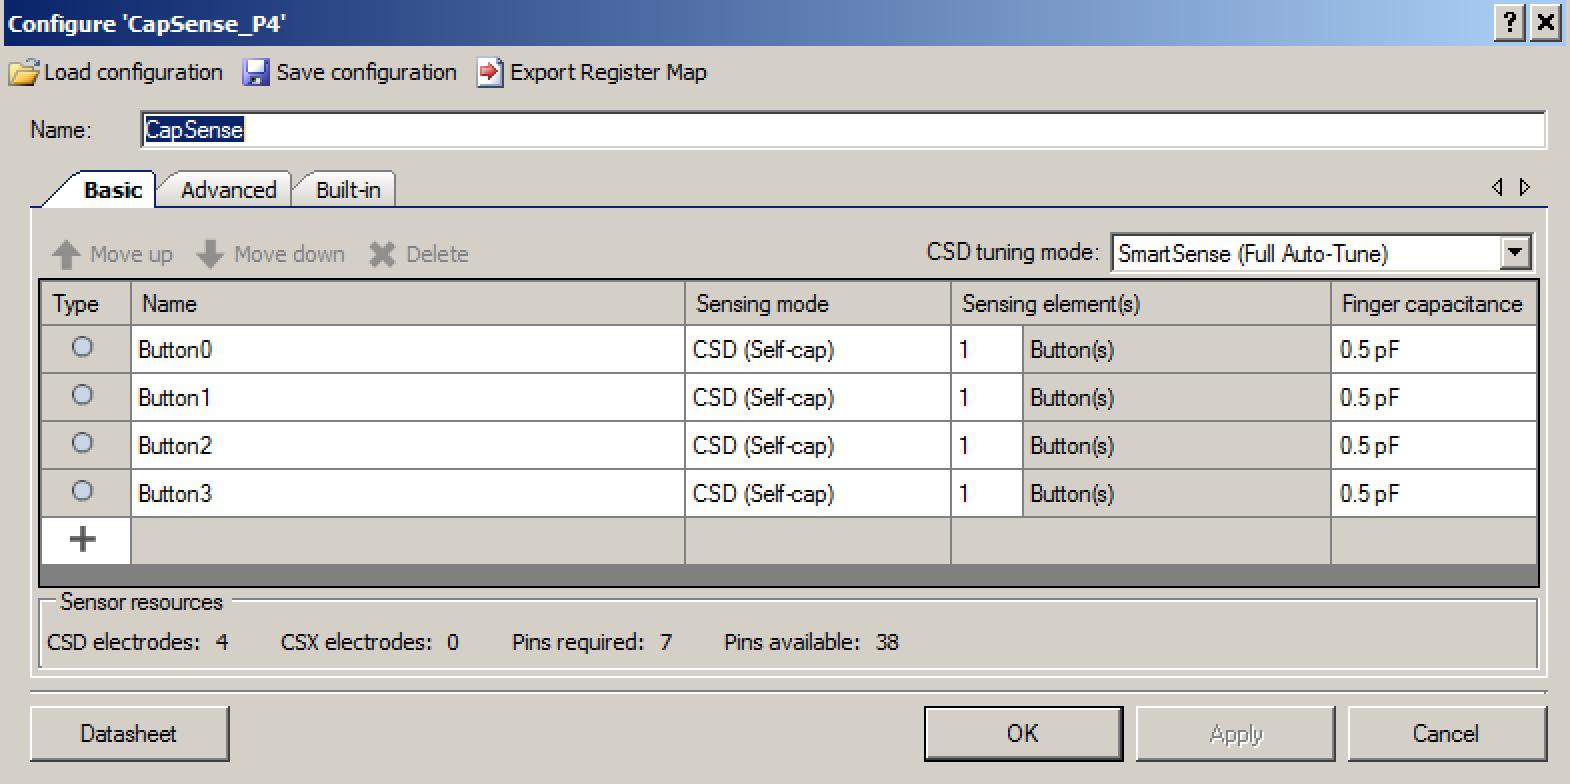 CapSense Configuration